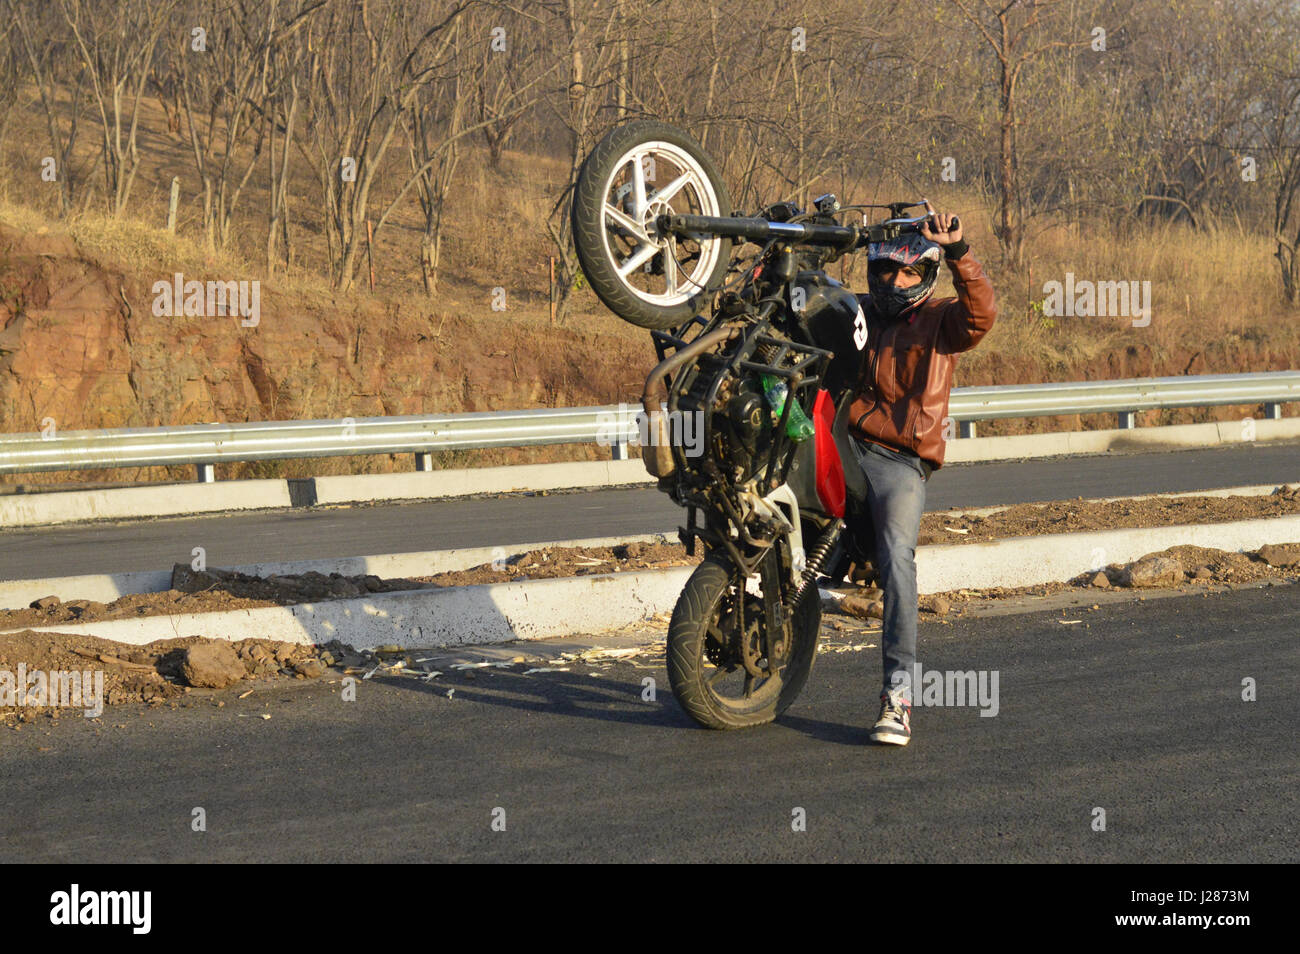 Stunt motorcycle rider performing at a local road near Pune, Maharashtra Stock Photo